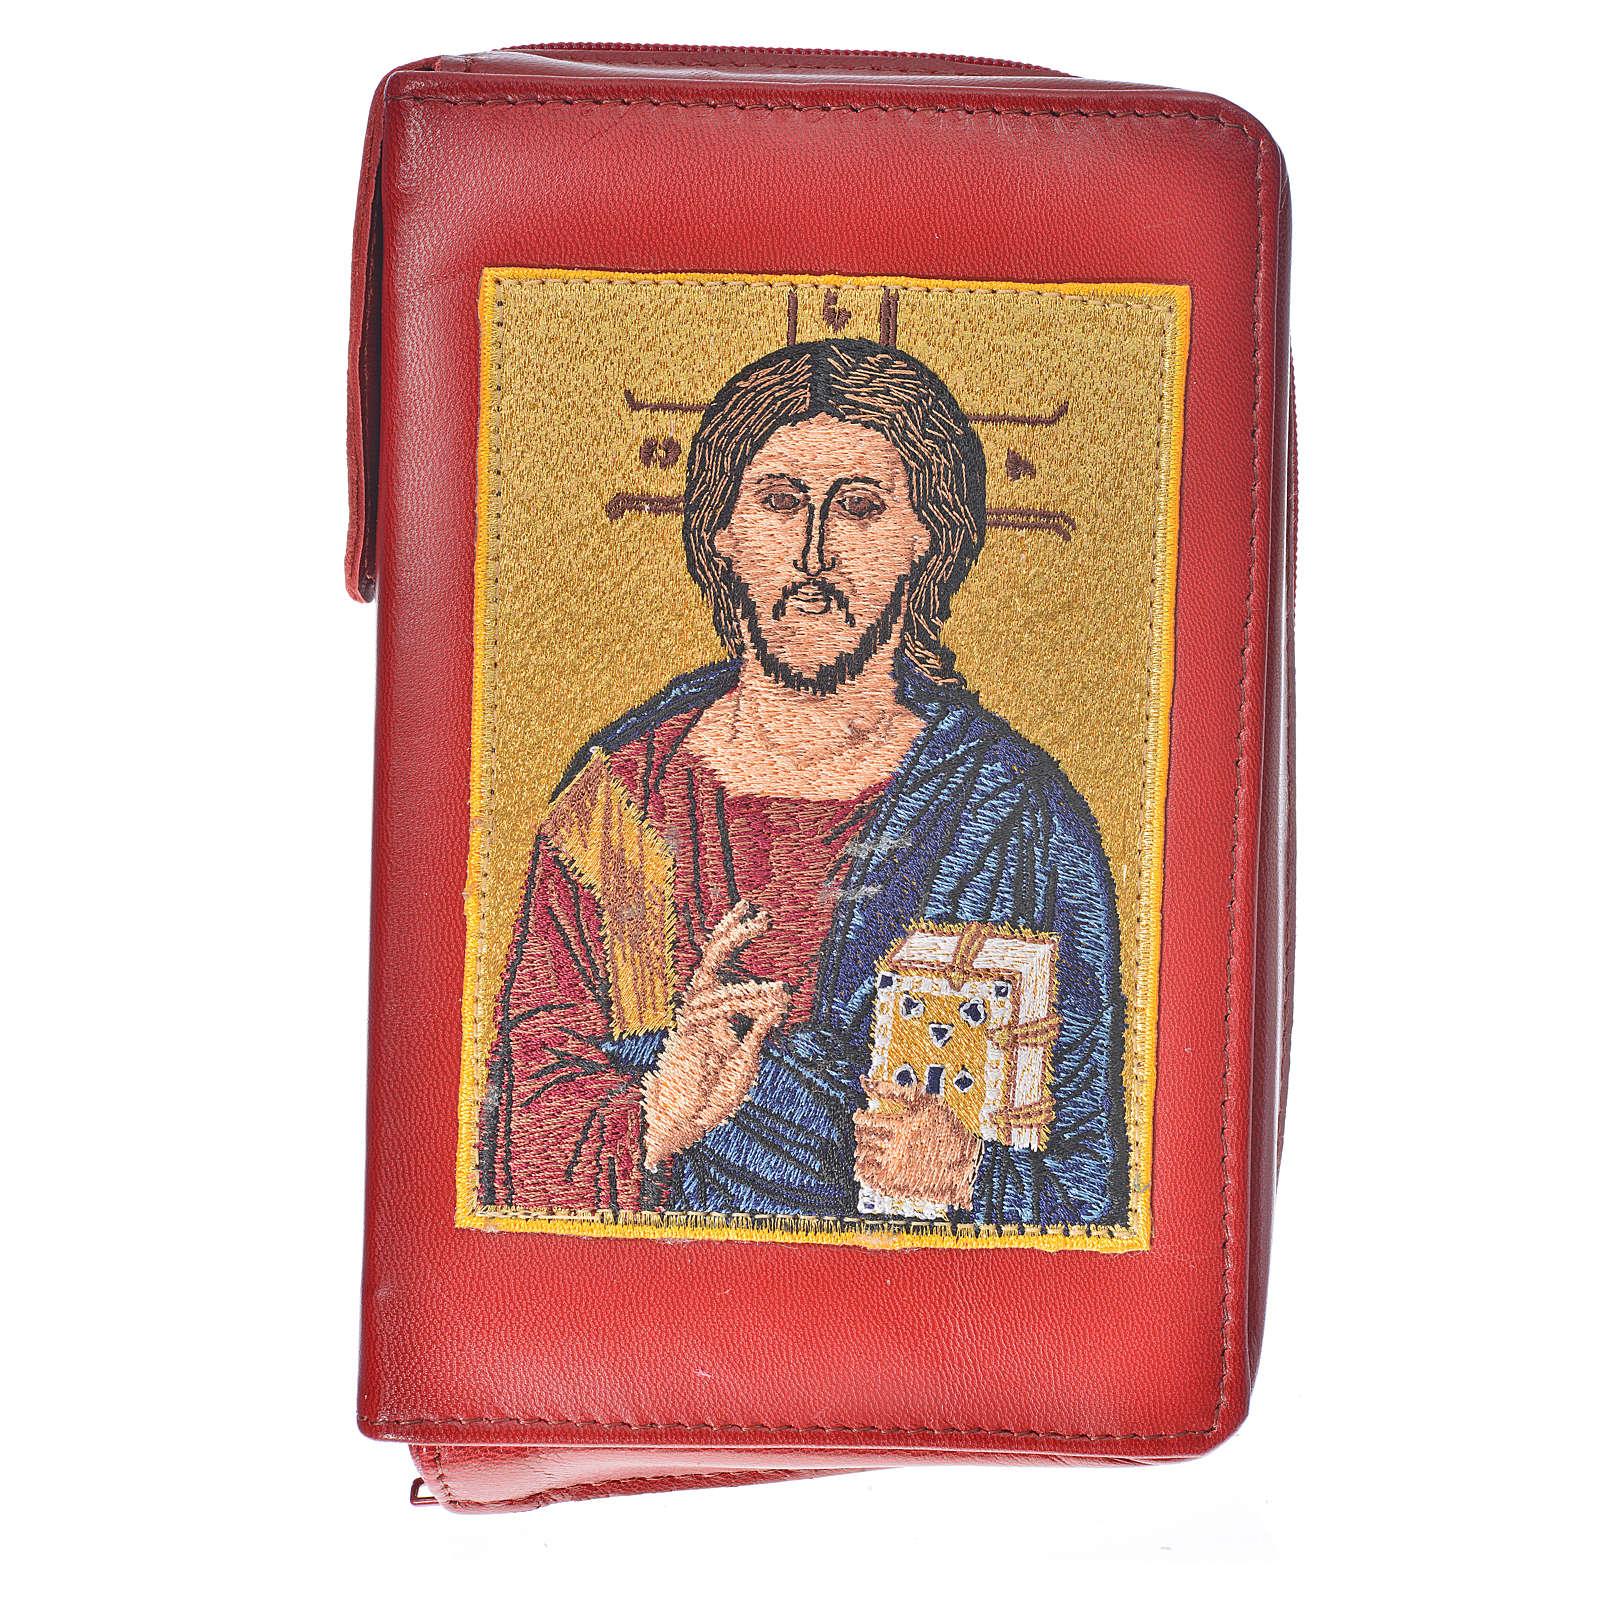 Funda Sagrada Biblia CEE ED. Pop. cuero burdeos Sagrada Familia 4